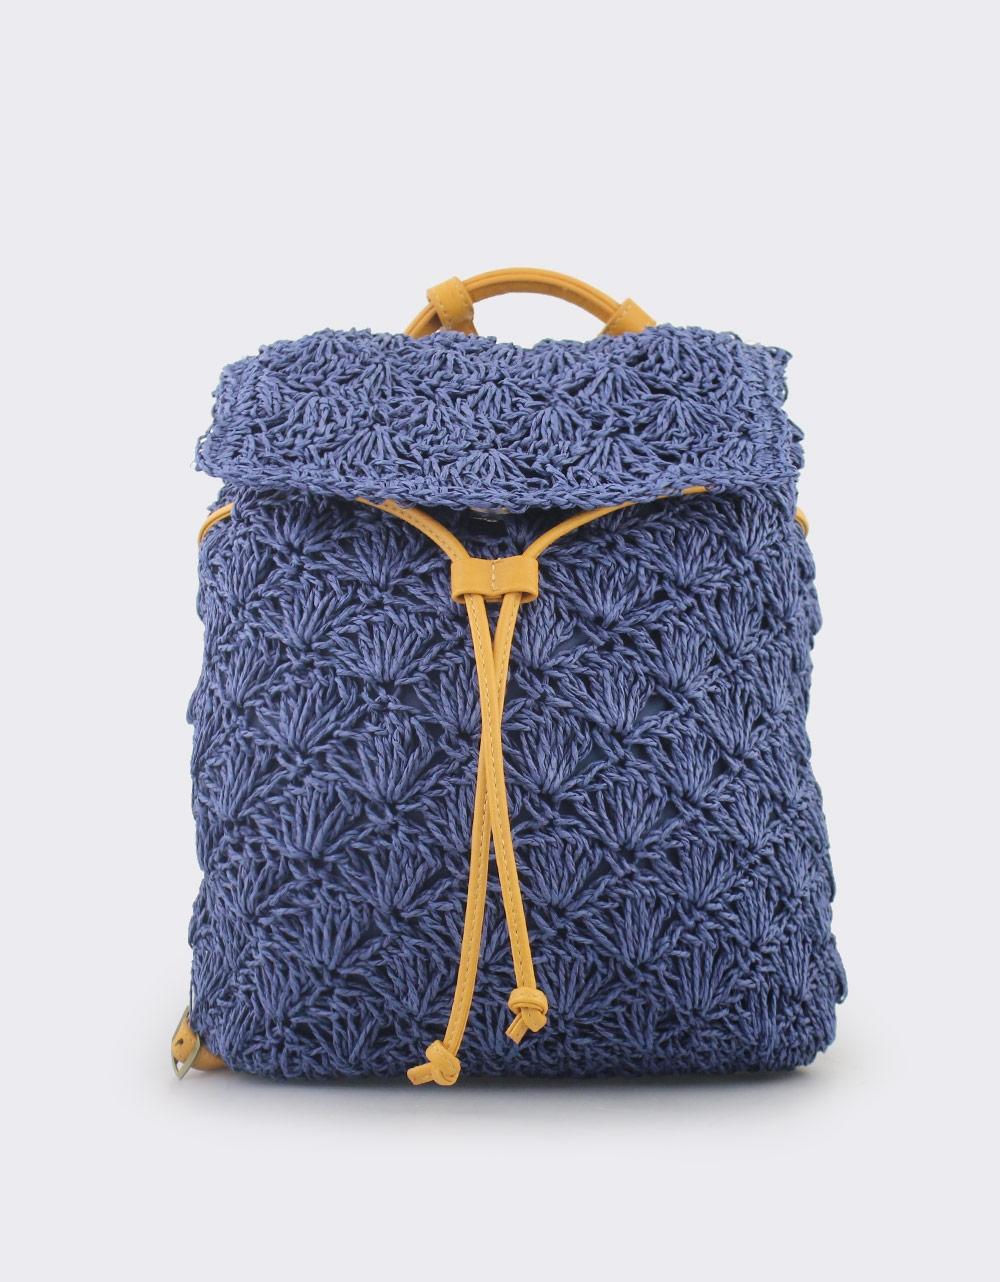 57bafe07d4 Εικόνα από Γυναικεία σακίδια πλάτης πλεκτά Μπλε